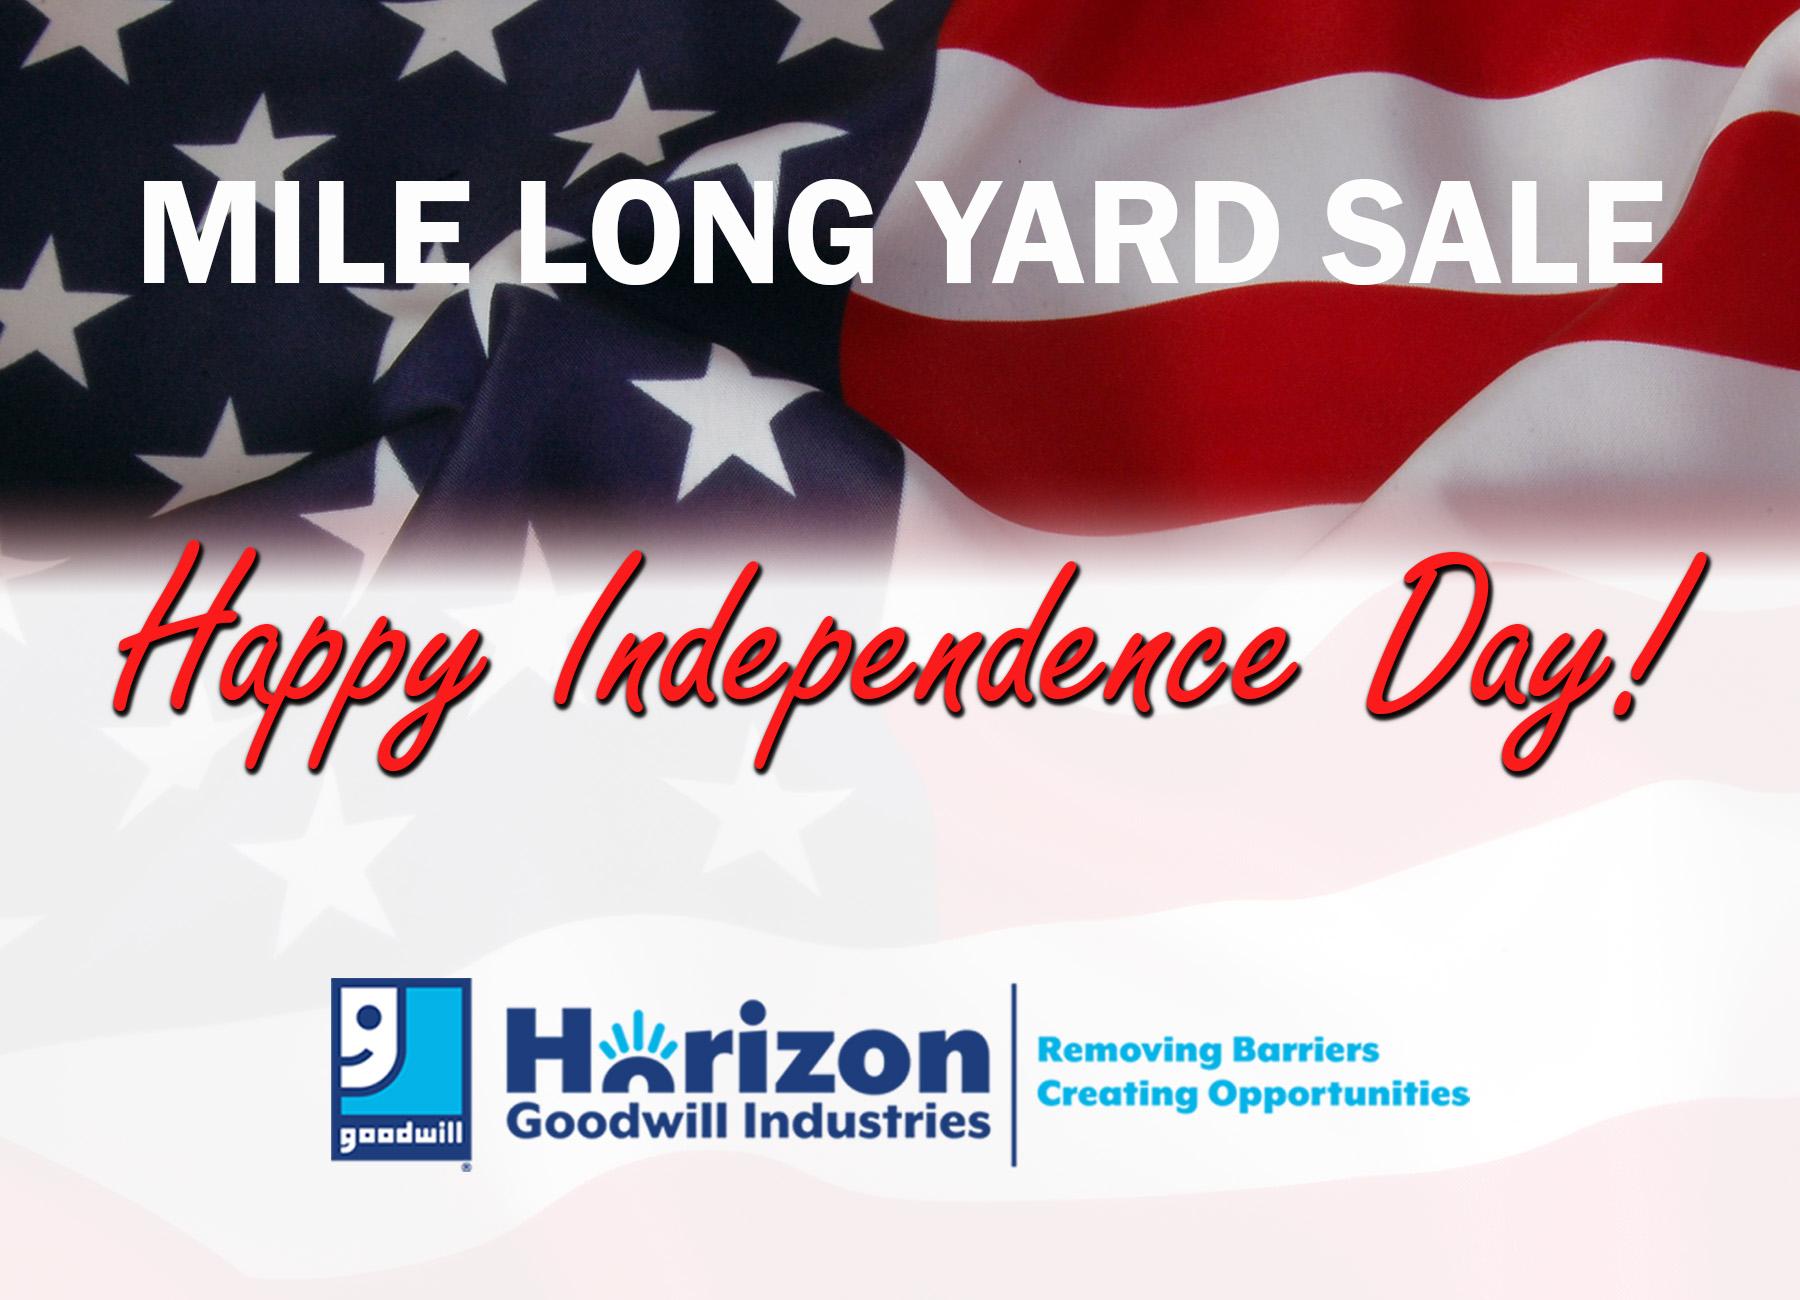 Mile-Long Yard Sale!